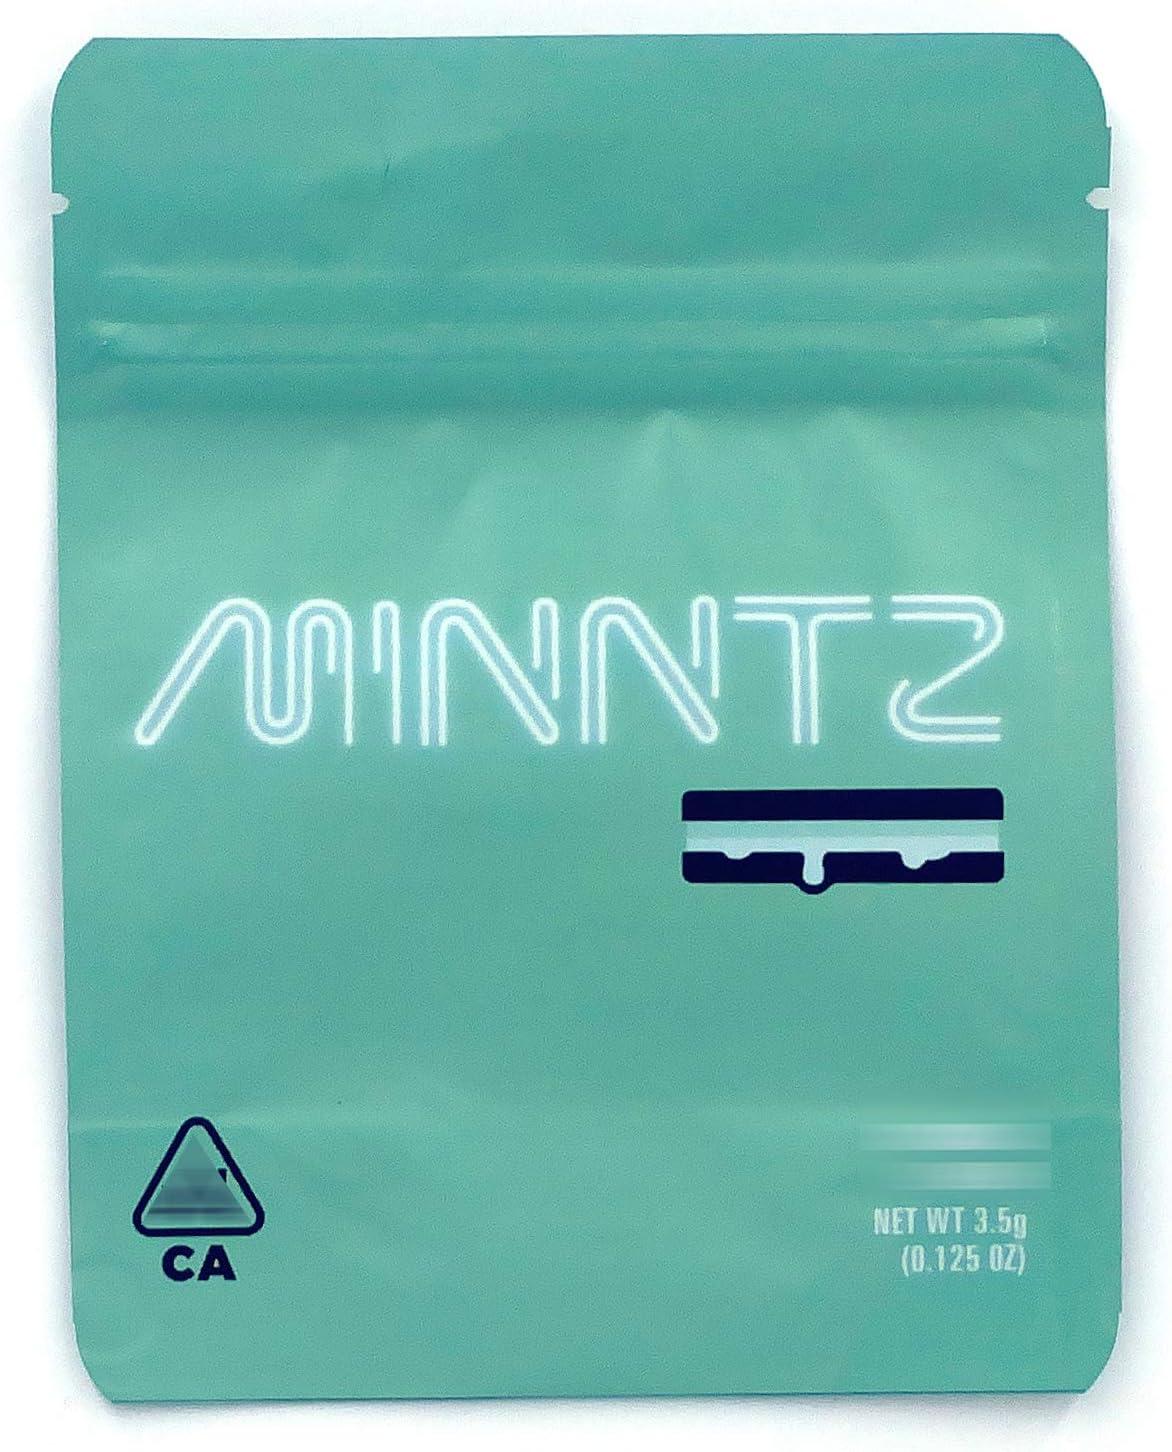 25ct YA HEMI GRANDIFLORA COOKIES Bags Empty Zip Lock w// STICKERS /& LABEL